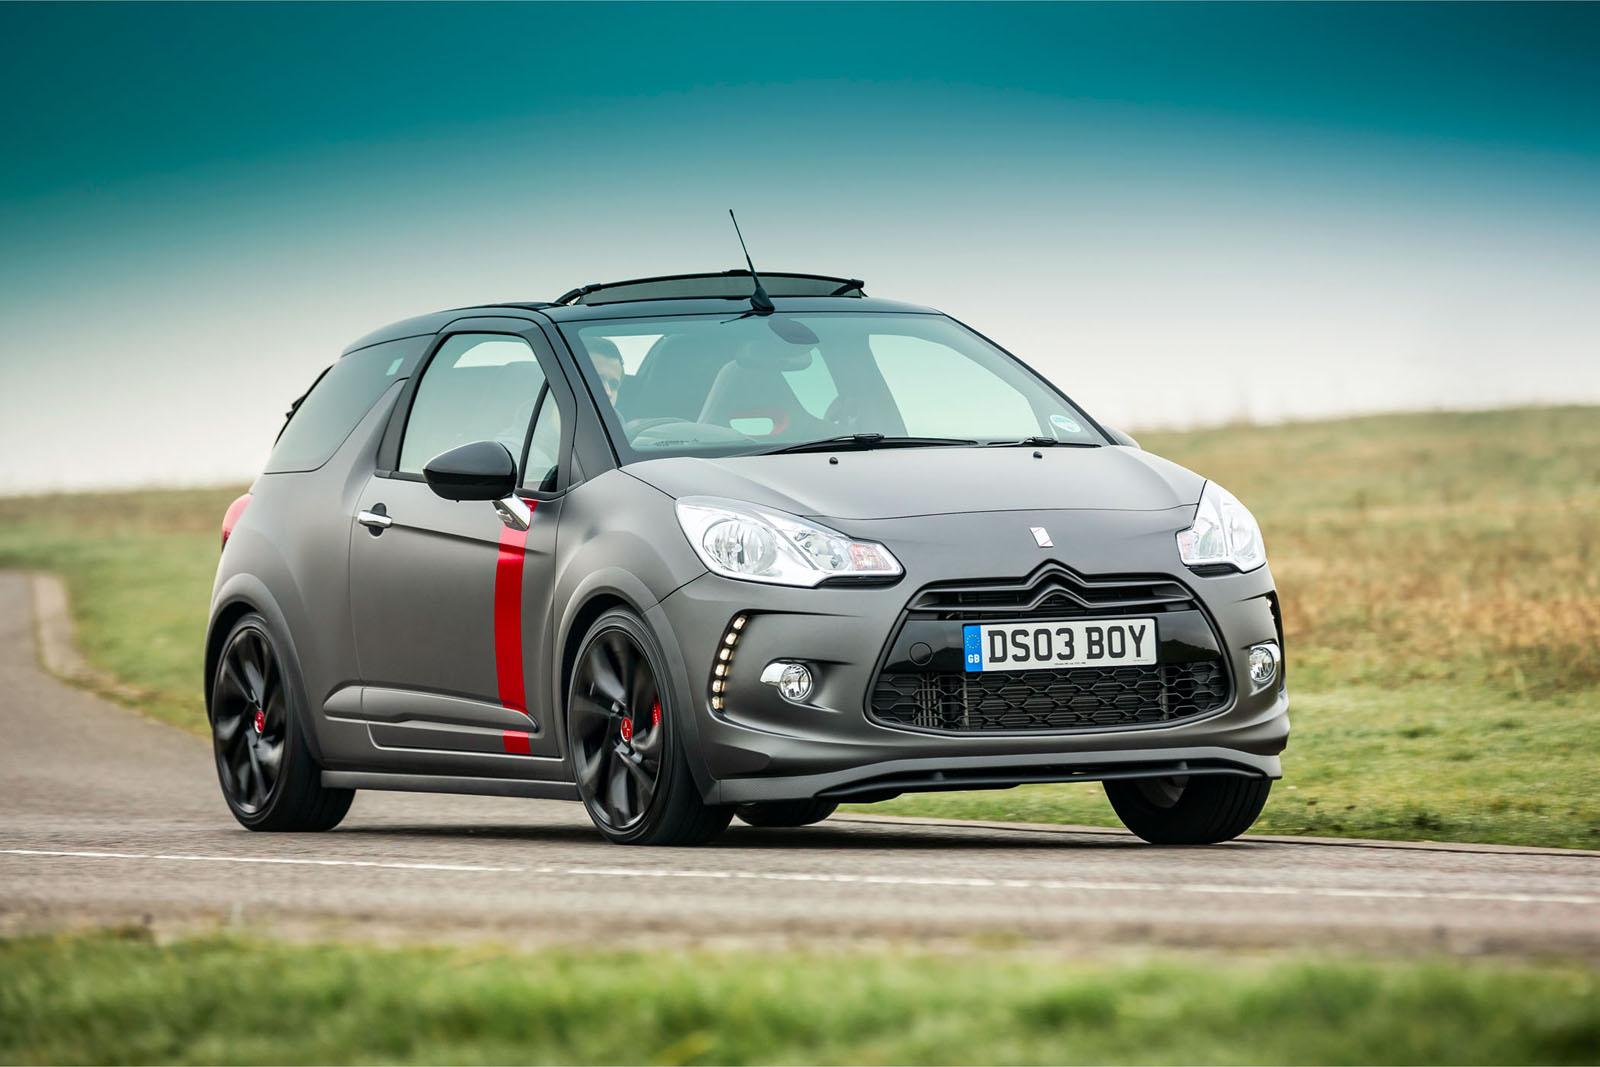 Citroen Prices DS3 Cabrio Racing In Britain Limits